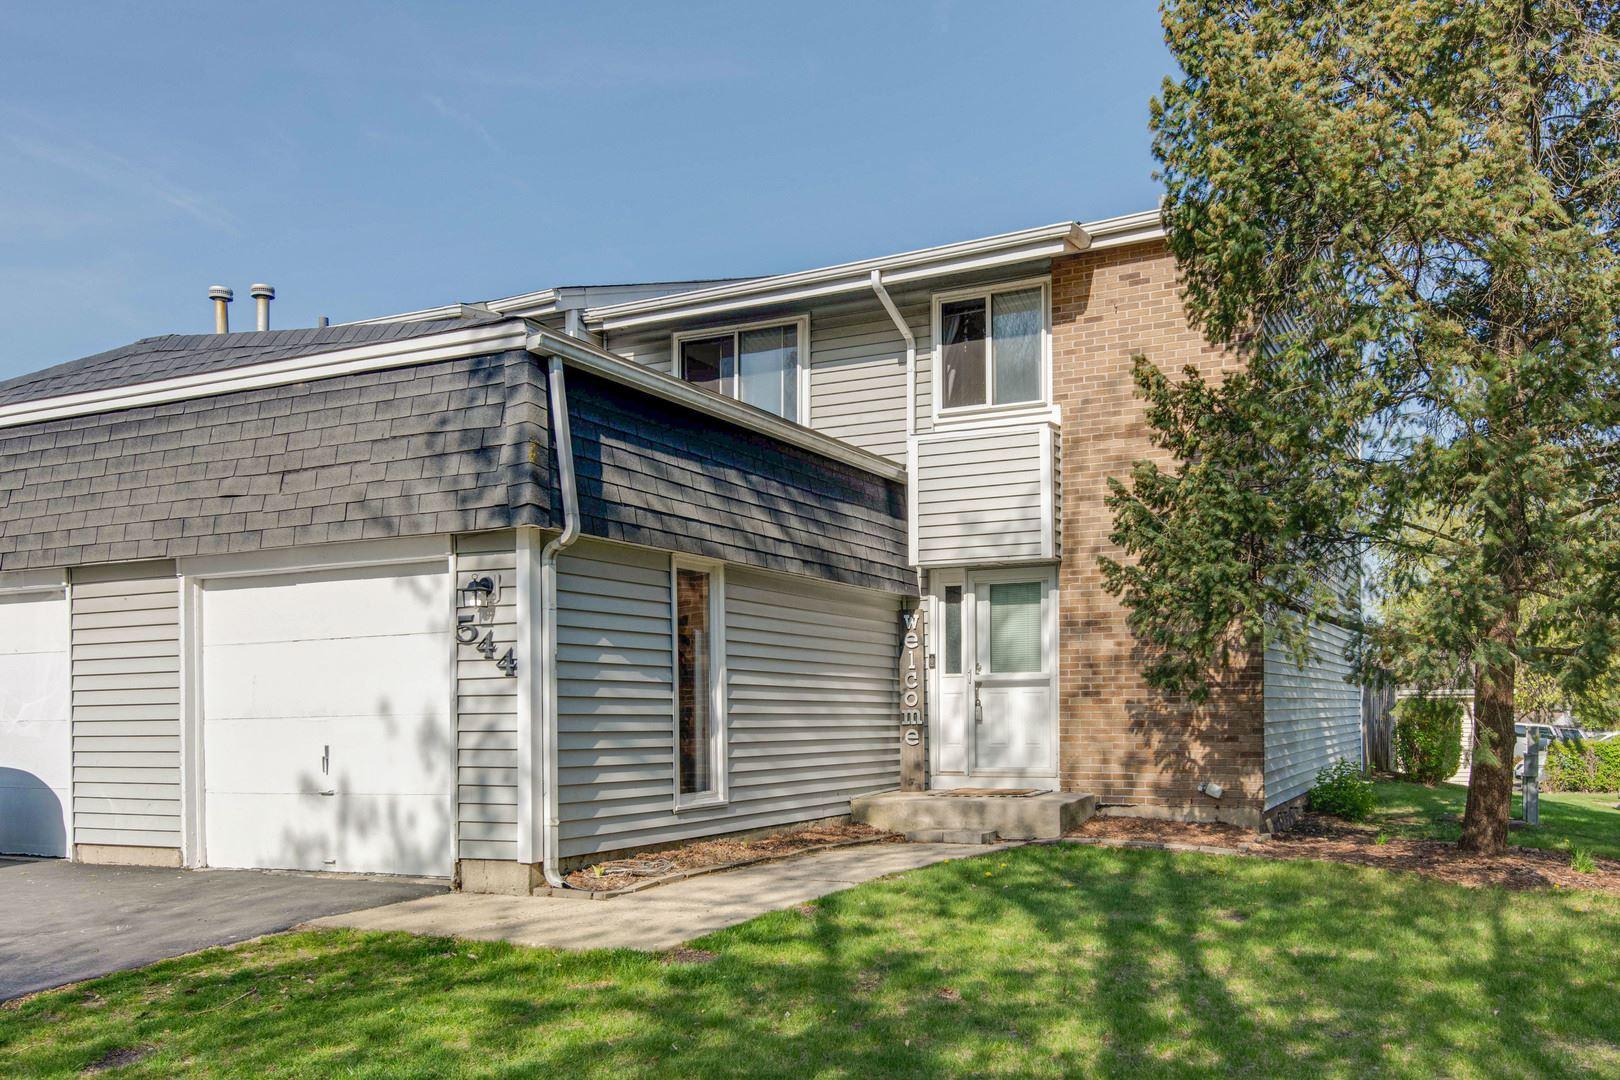 Photo of 544 Porter Lane, Bolingbrook, IL 60440 (MLS # 11068599)